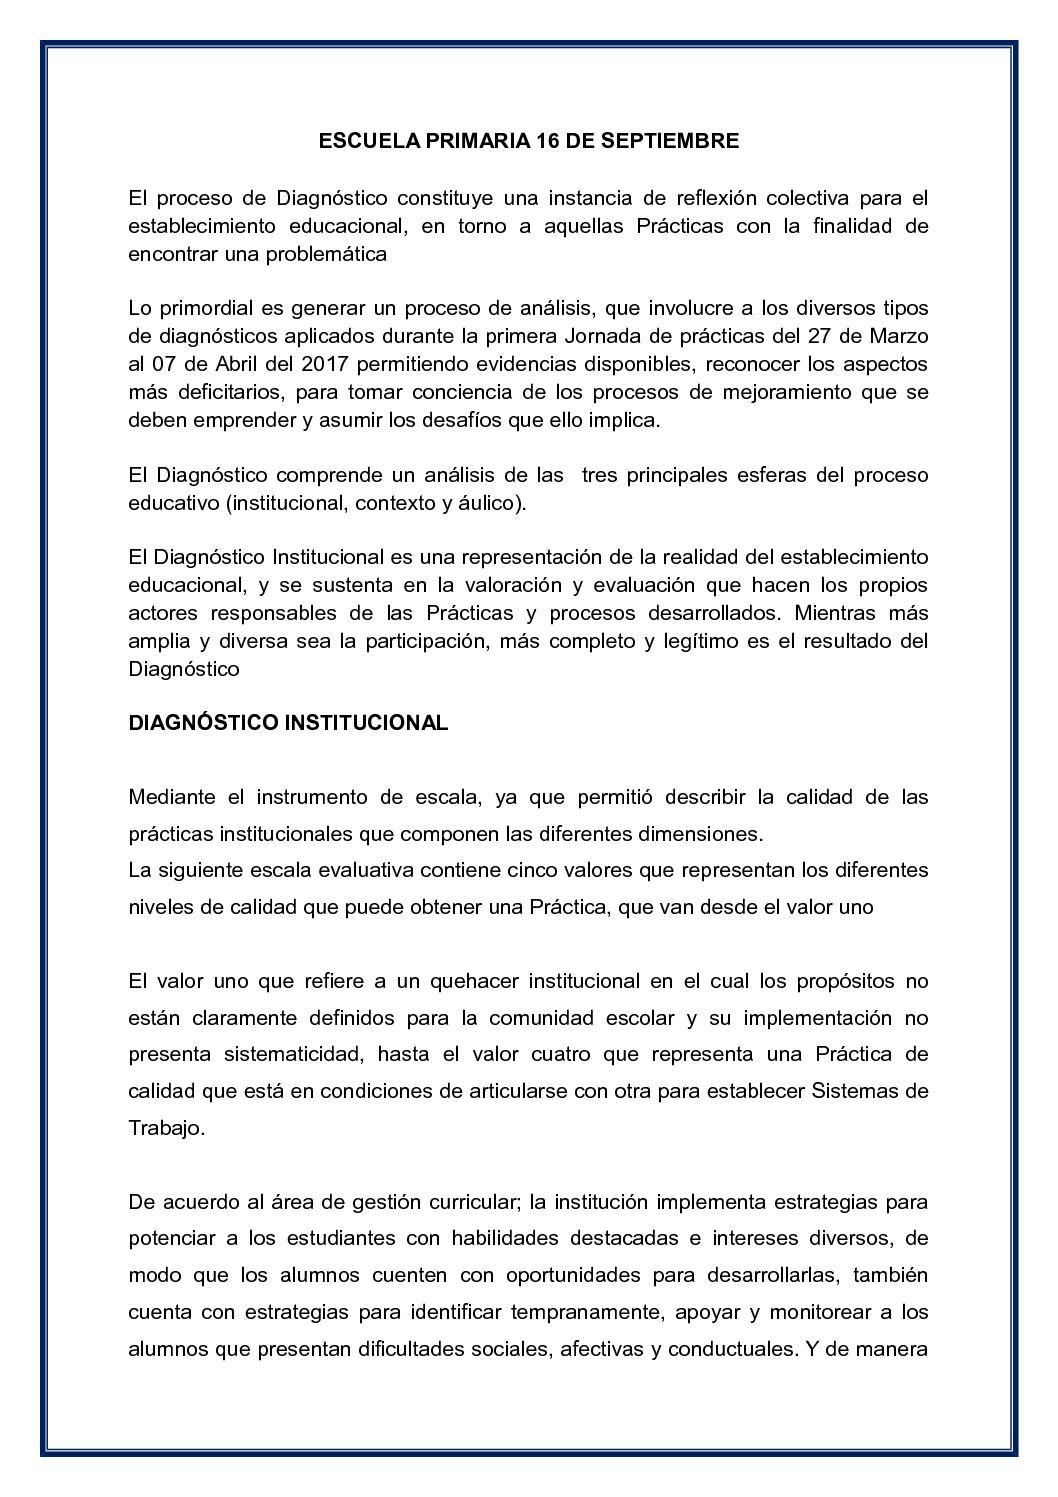 INFORME DIAGNOSTICO INSTITUCIONAL  TRABAJO 3